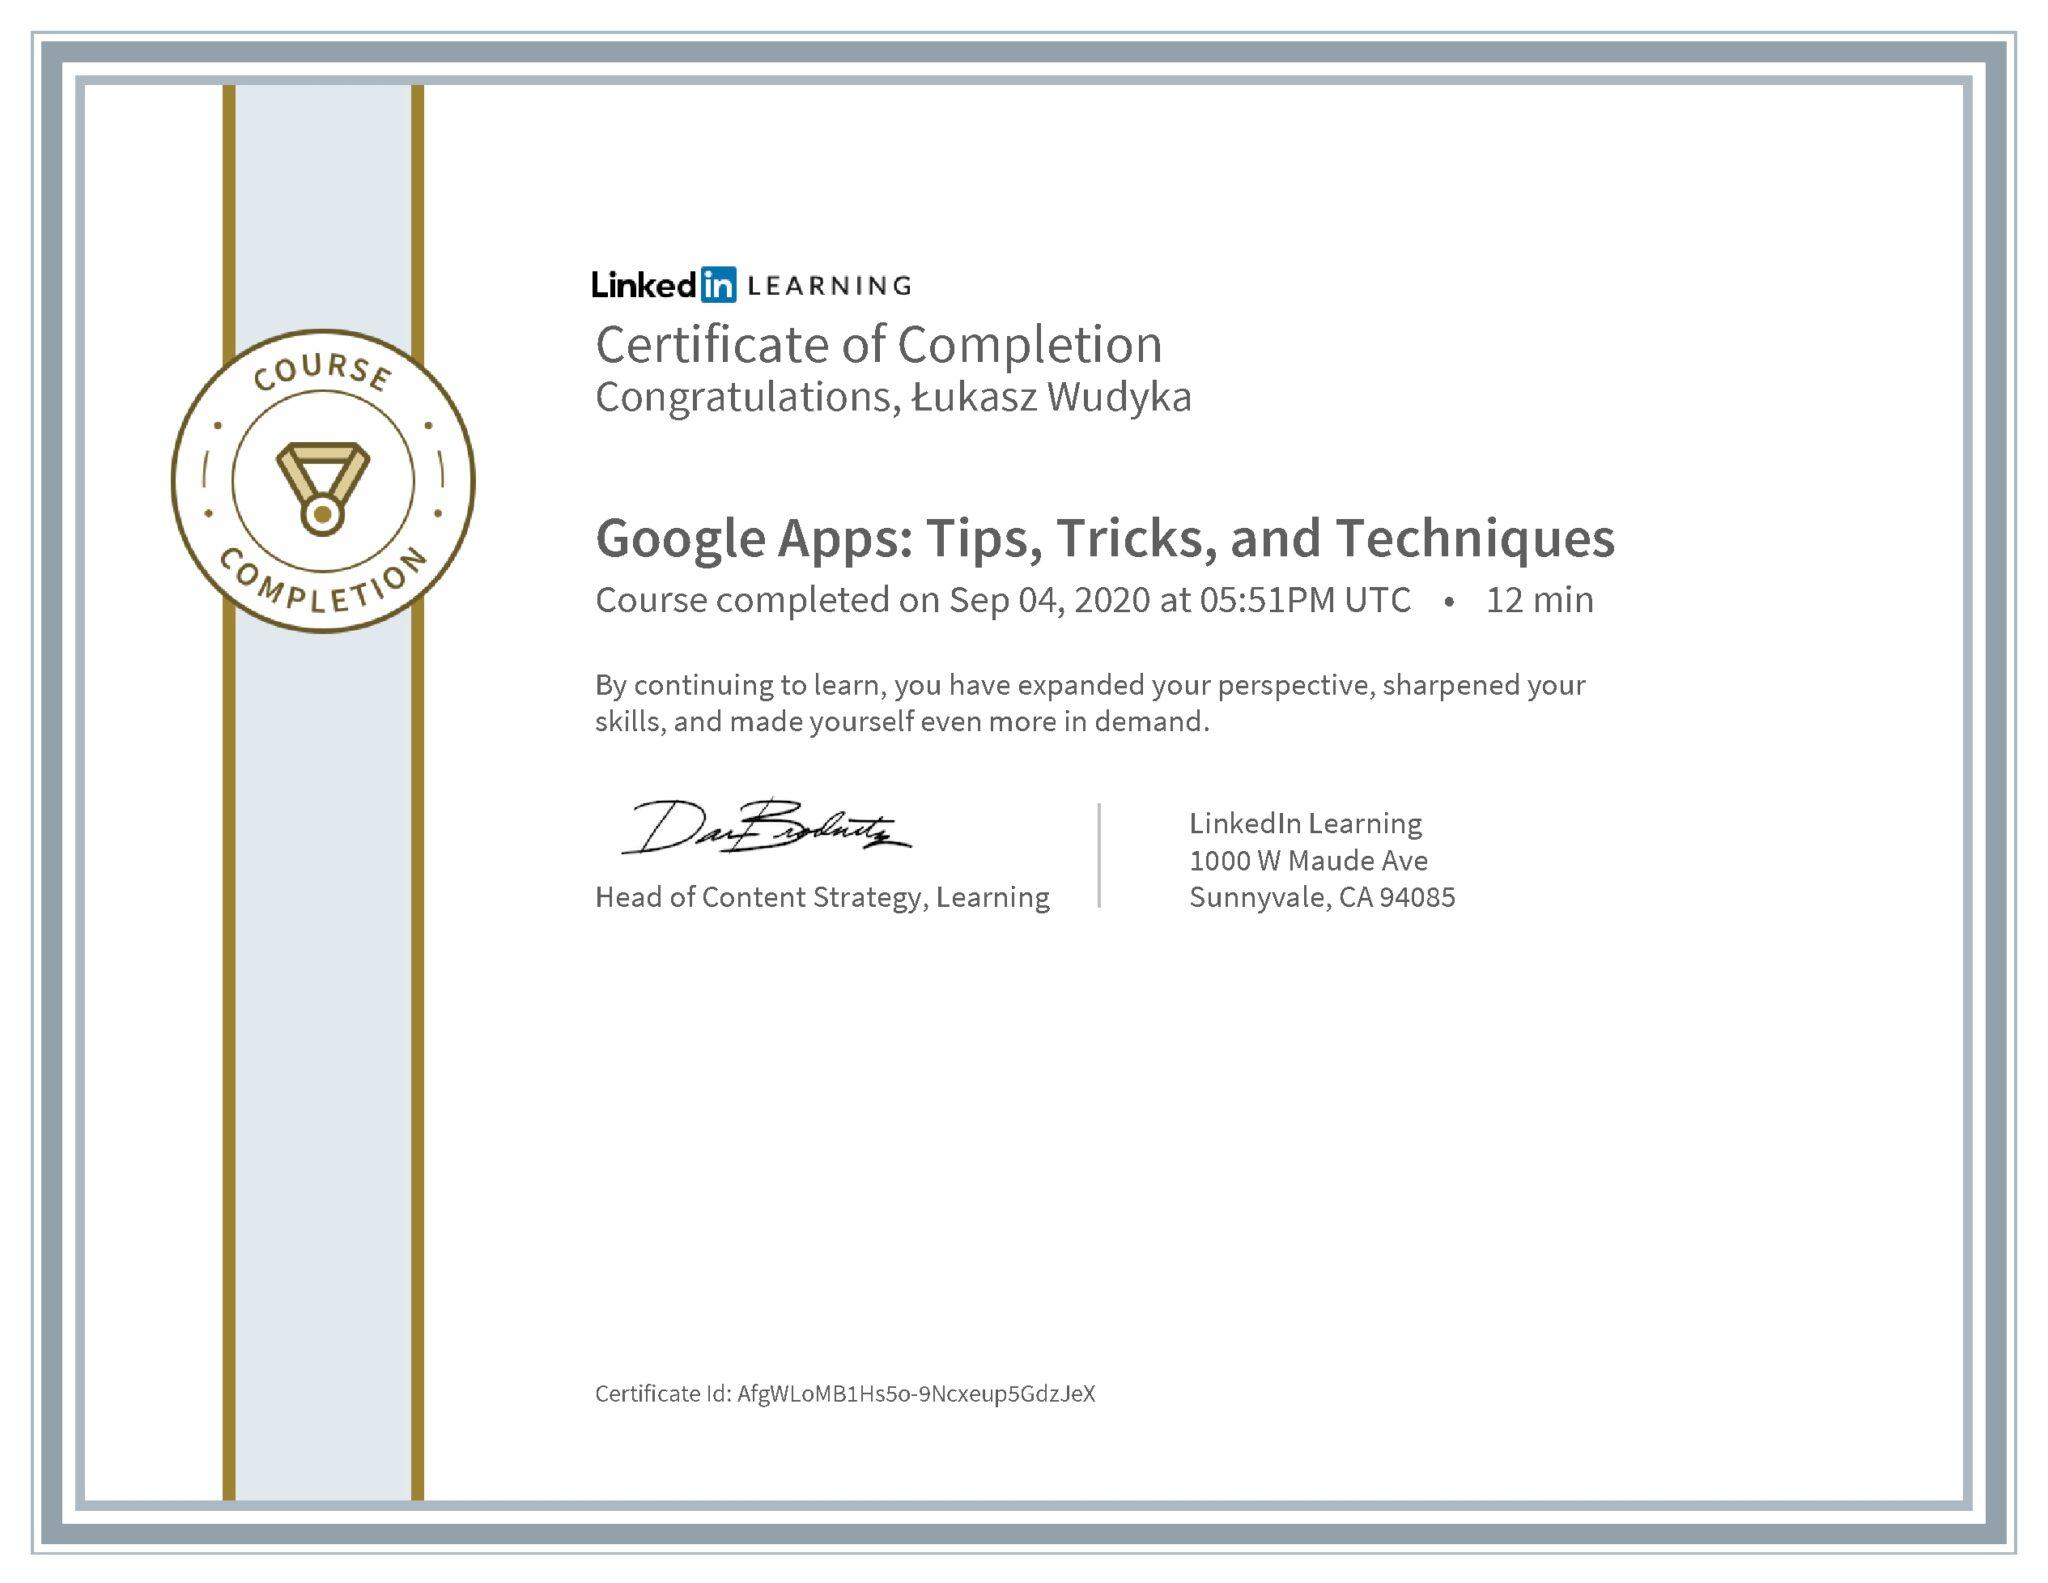 Łukasz Wudyka certyfikat LinkedIn Google Apps: Tips, Tricks, and Techniques